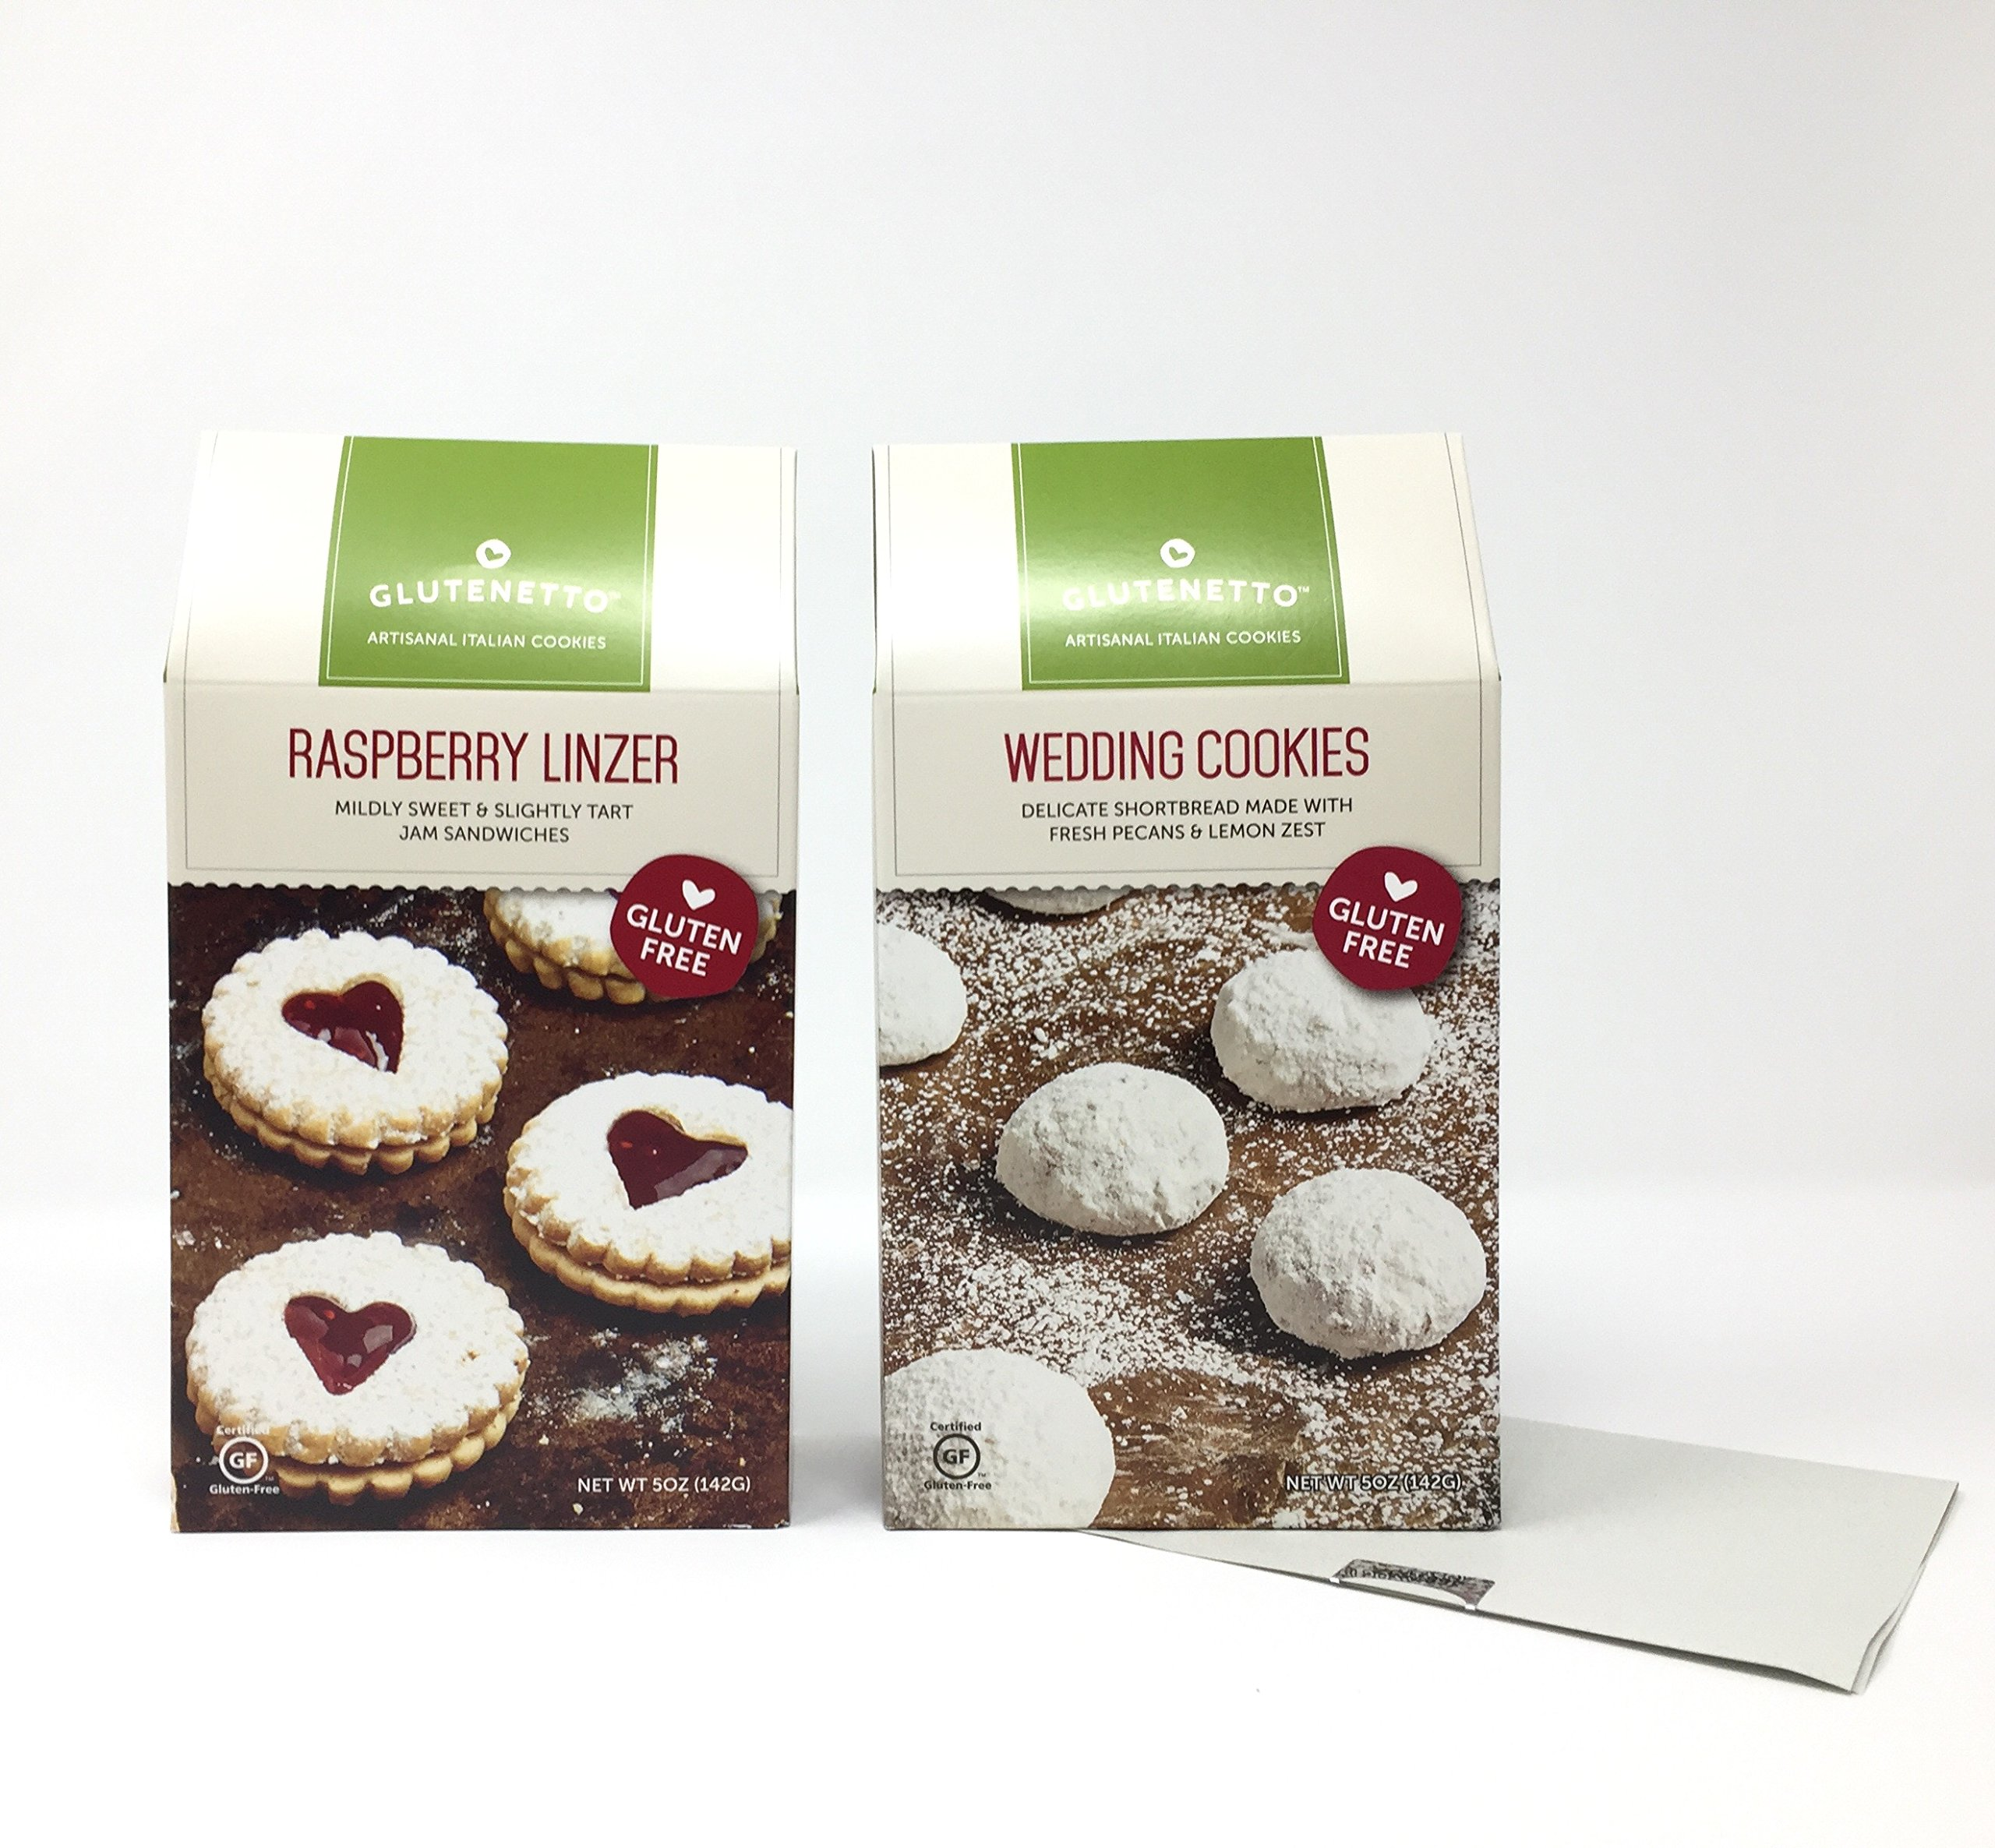 GLUTEN FREE Cookies. GLUTENETTO Gourmet Raspberry & Glutenetto GF Gourmet Shortbread Wedding. Plus a Bonus Free GFREE NUT FREE 3- Item Candy Recipe from Z-Organics.(2 Items)